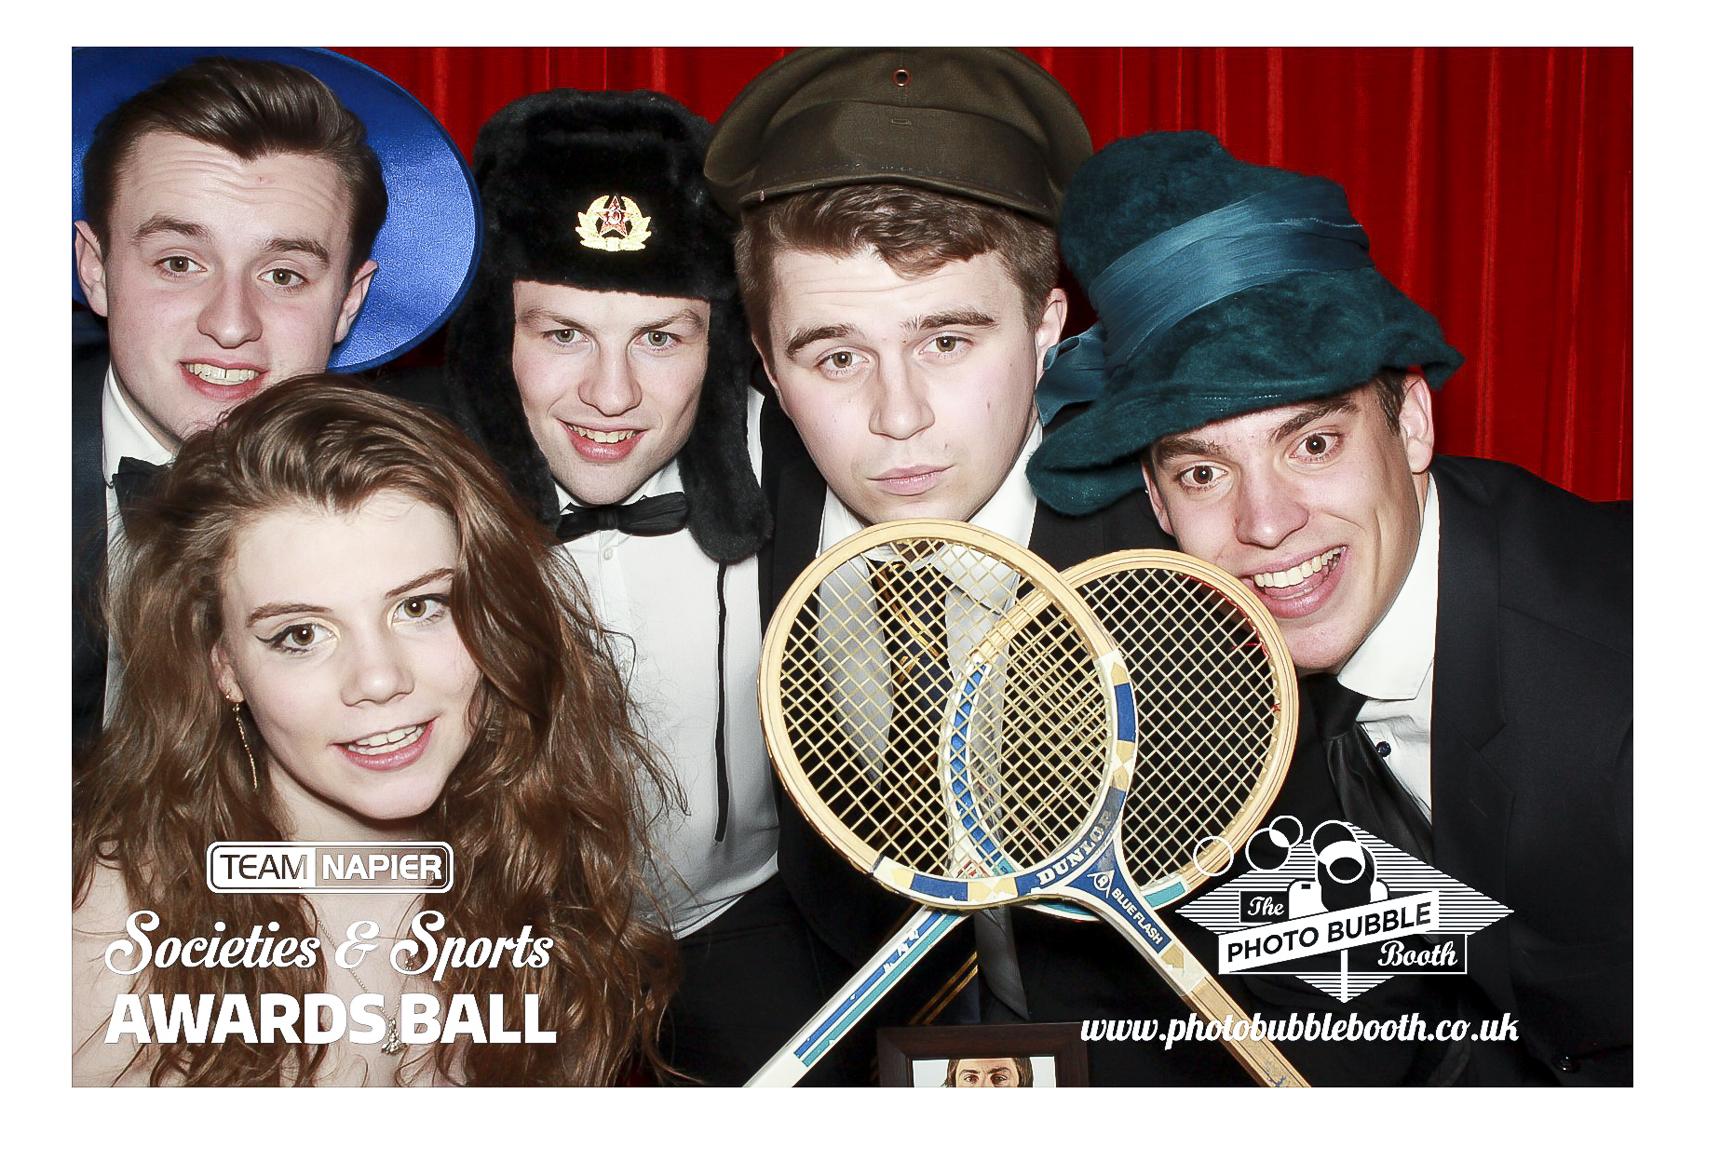 Napier Societies & Sports Awards_111.JPG